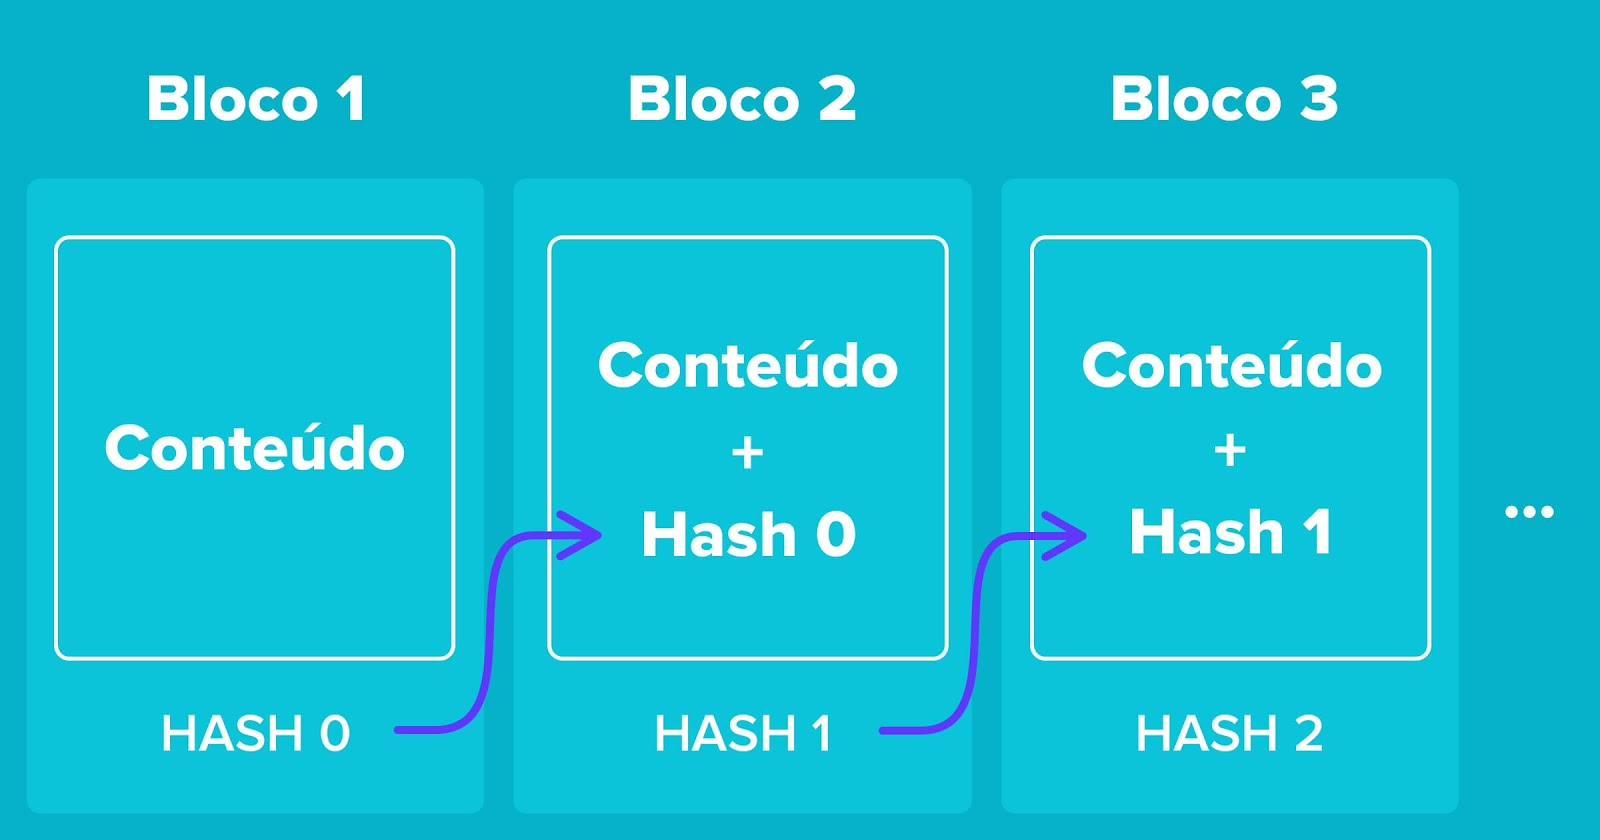 Como funciona blockchain